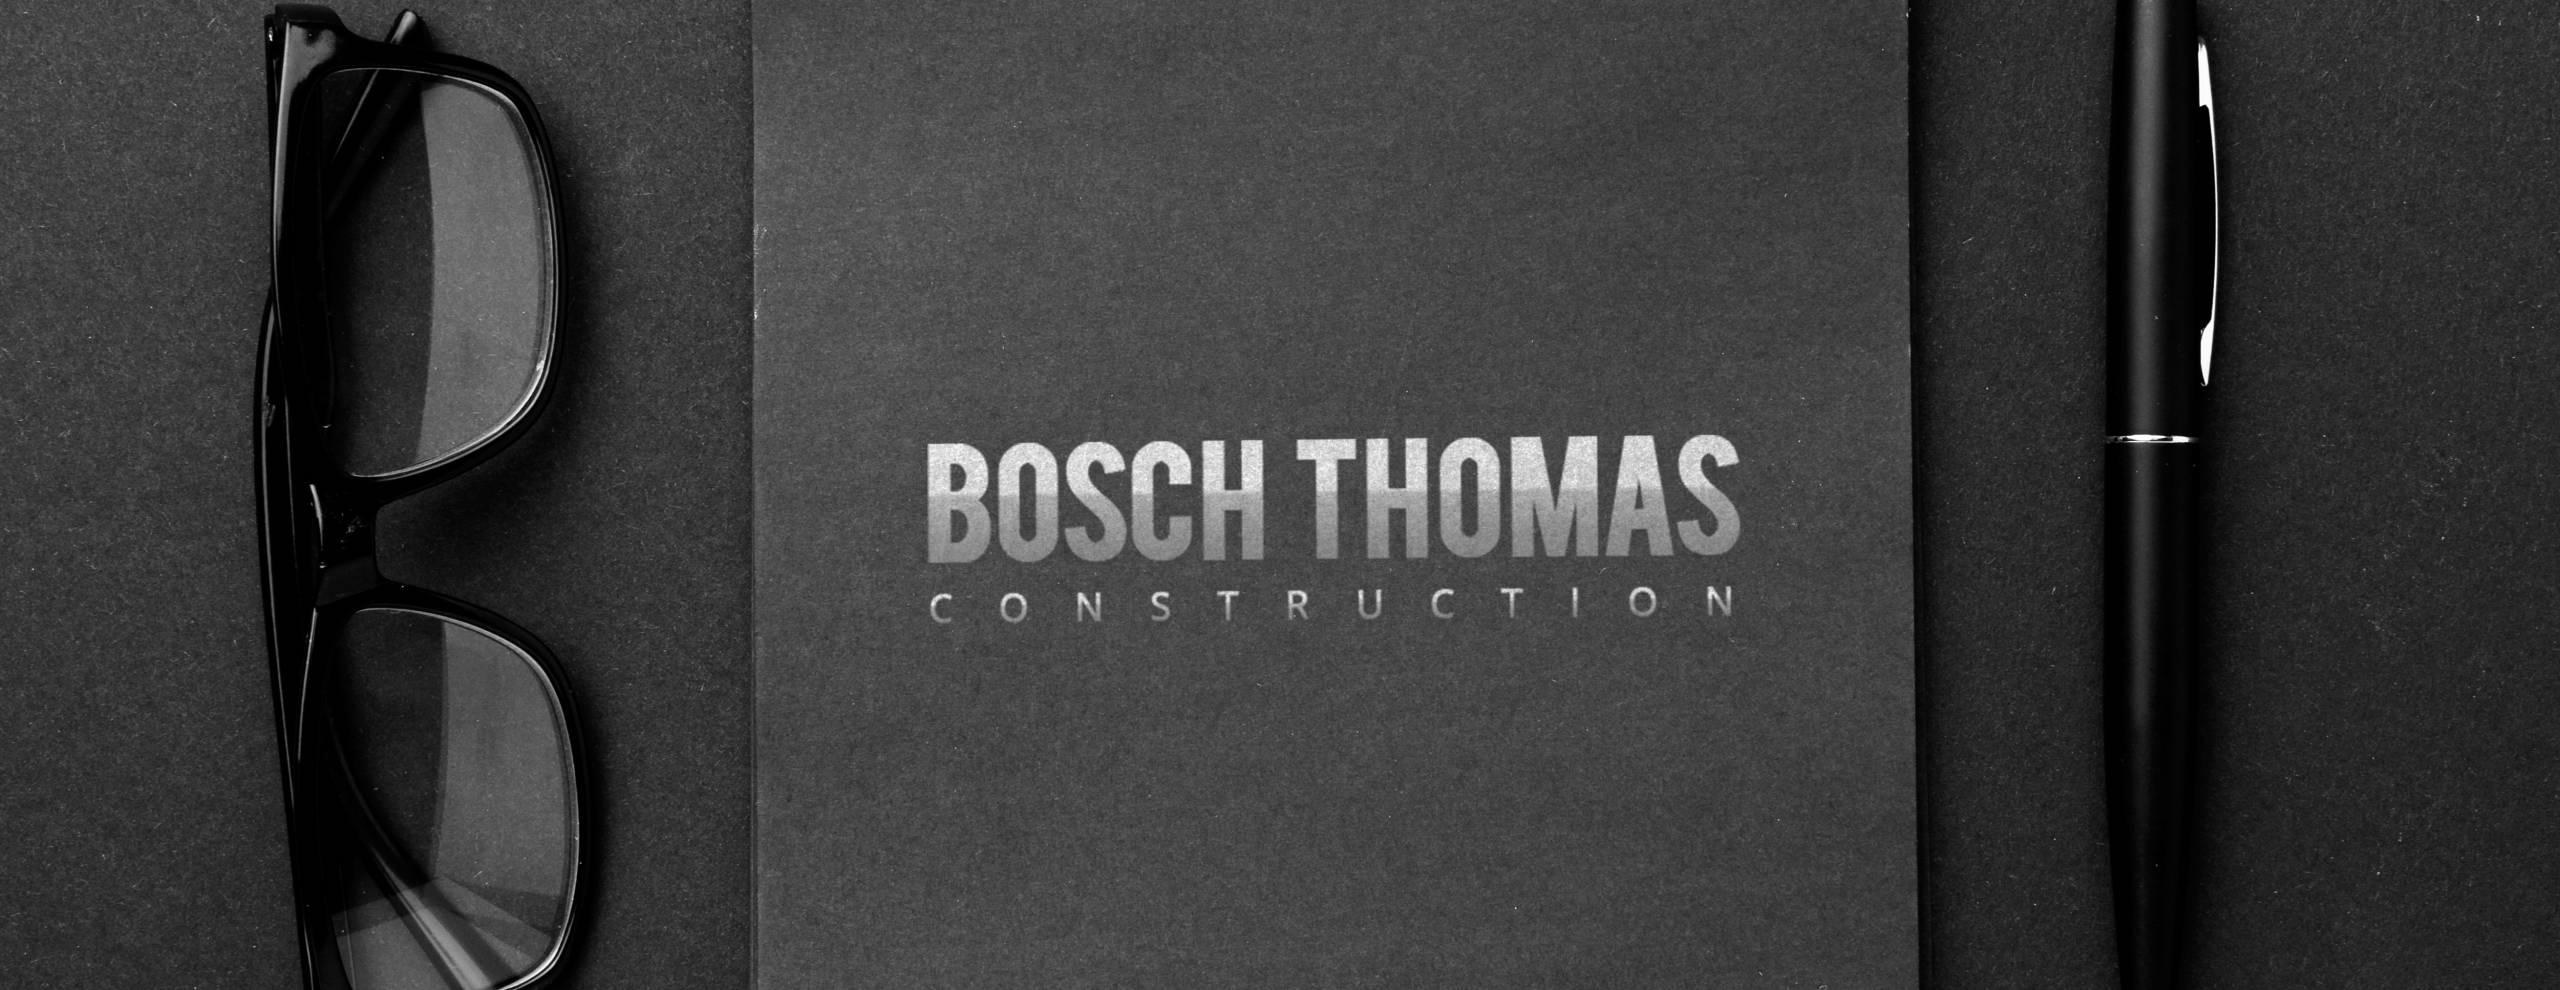 bosch-5-scaled-1-1